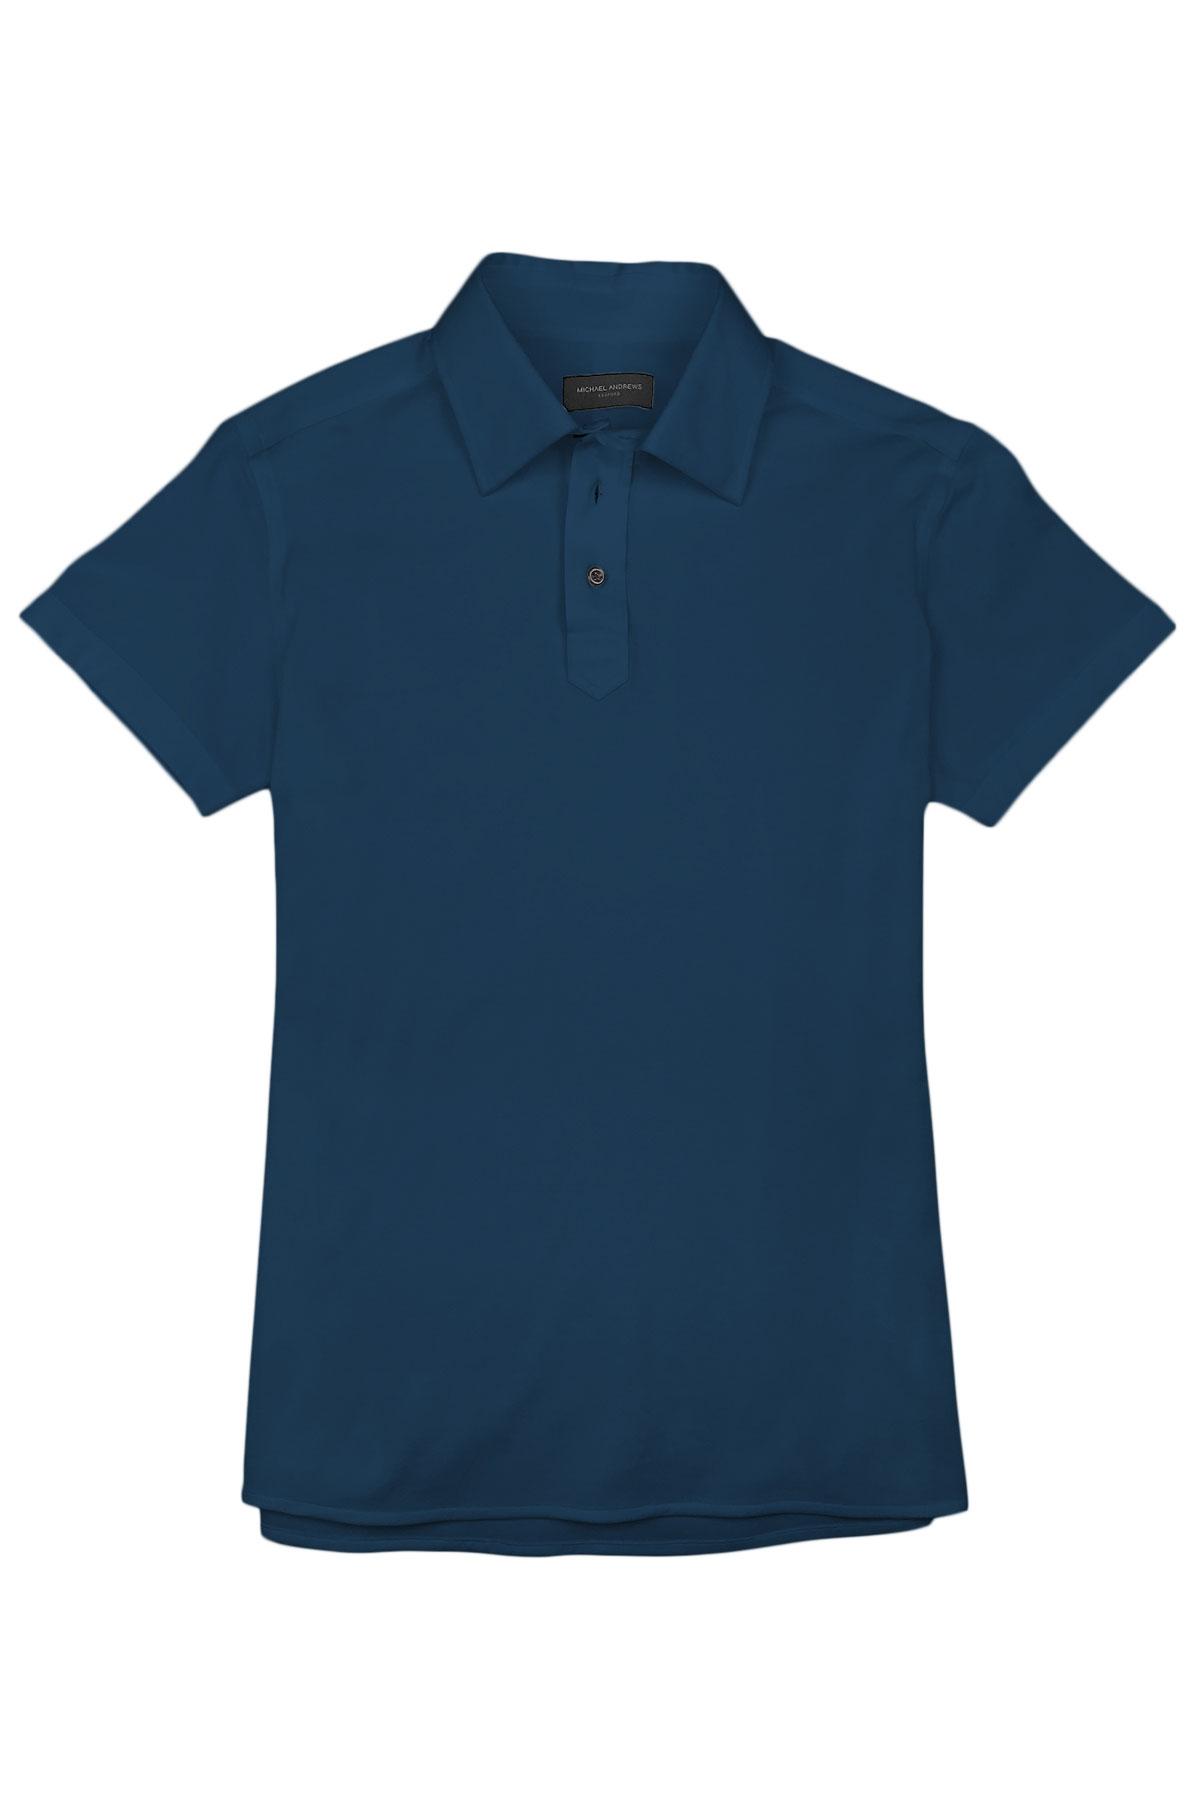 Prussian Blue Pique Polo Shirt